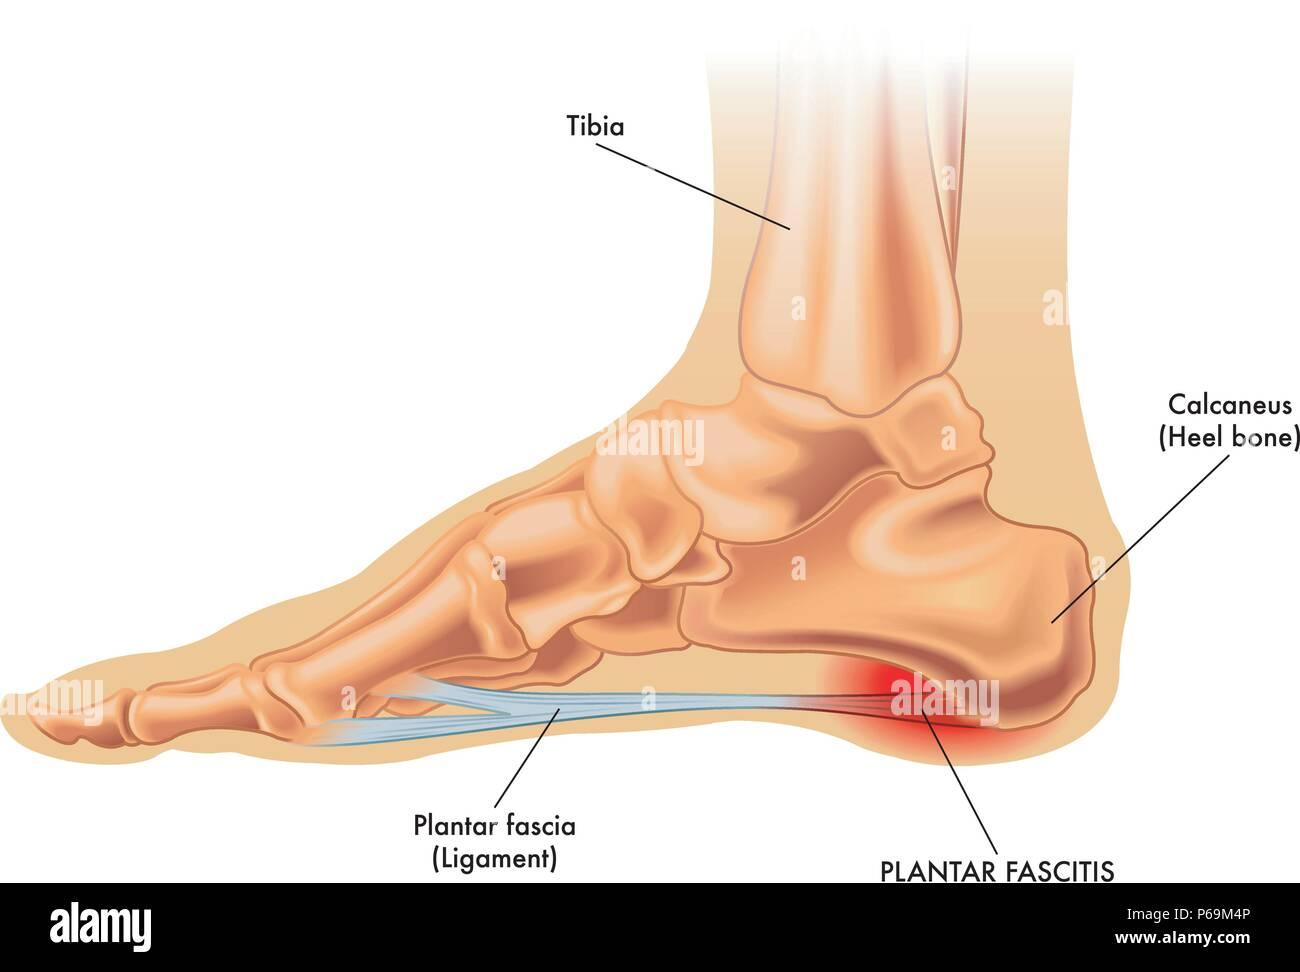 Foot Injury Stock Photos & Foot Injury Stock Images - Alamy